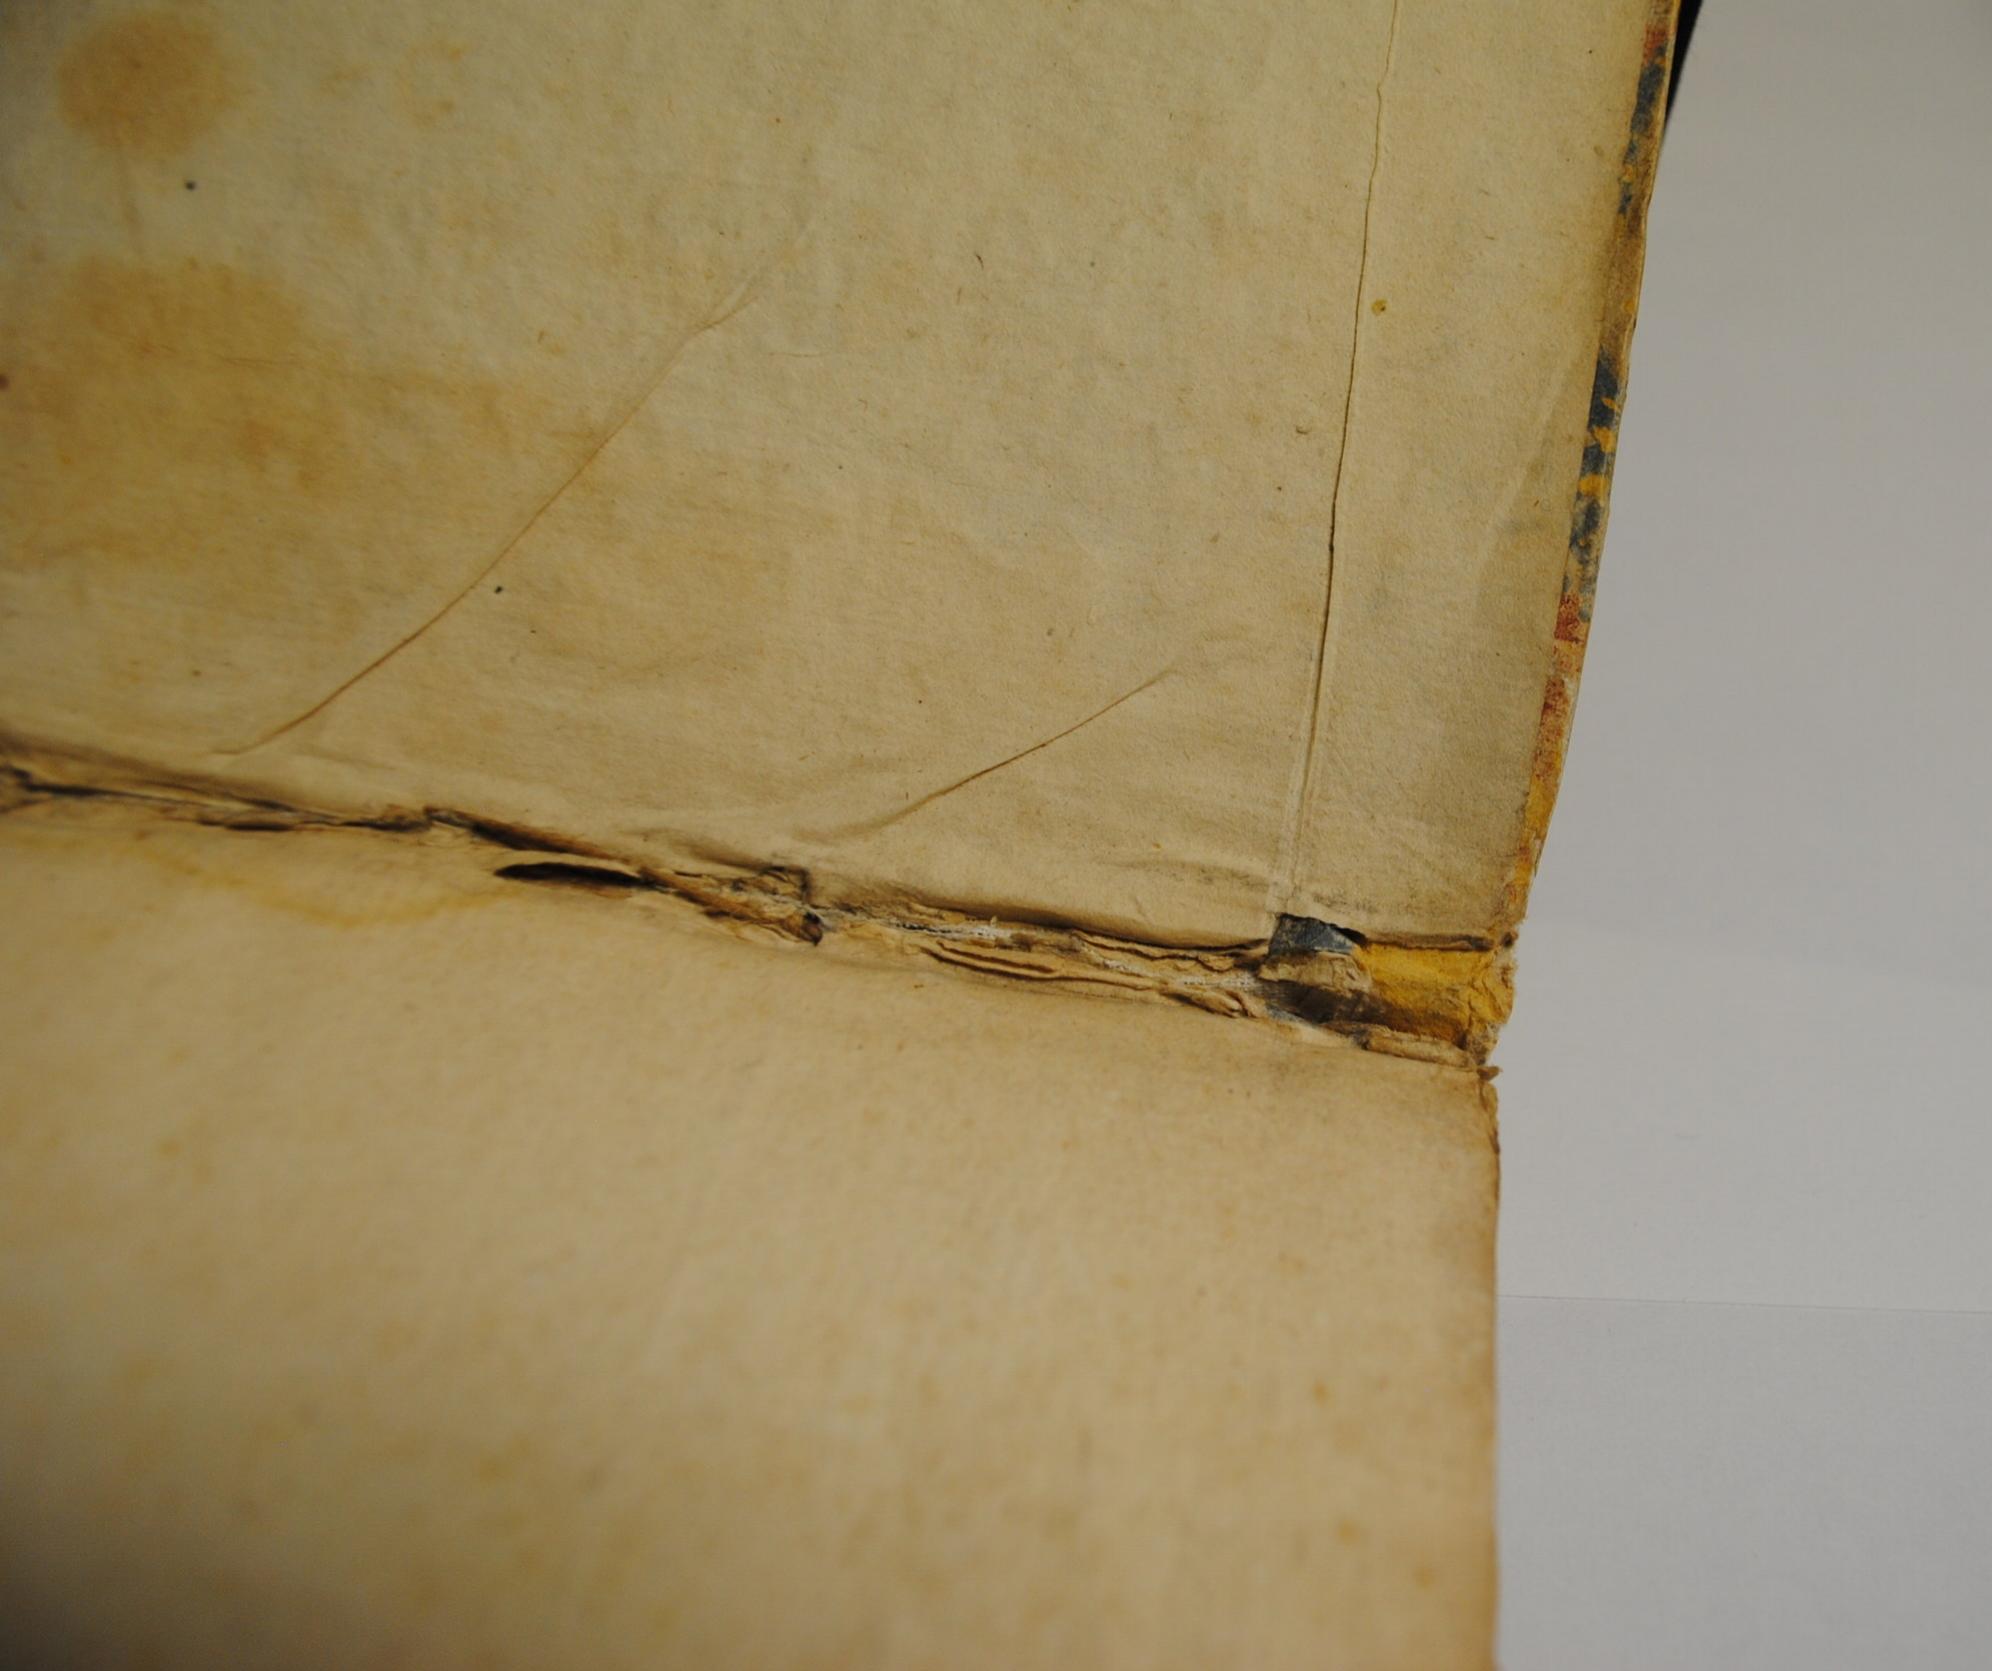 Inner hinge that requires repairing.